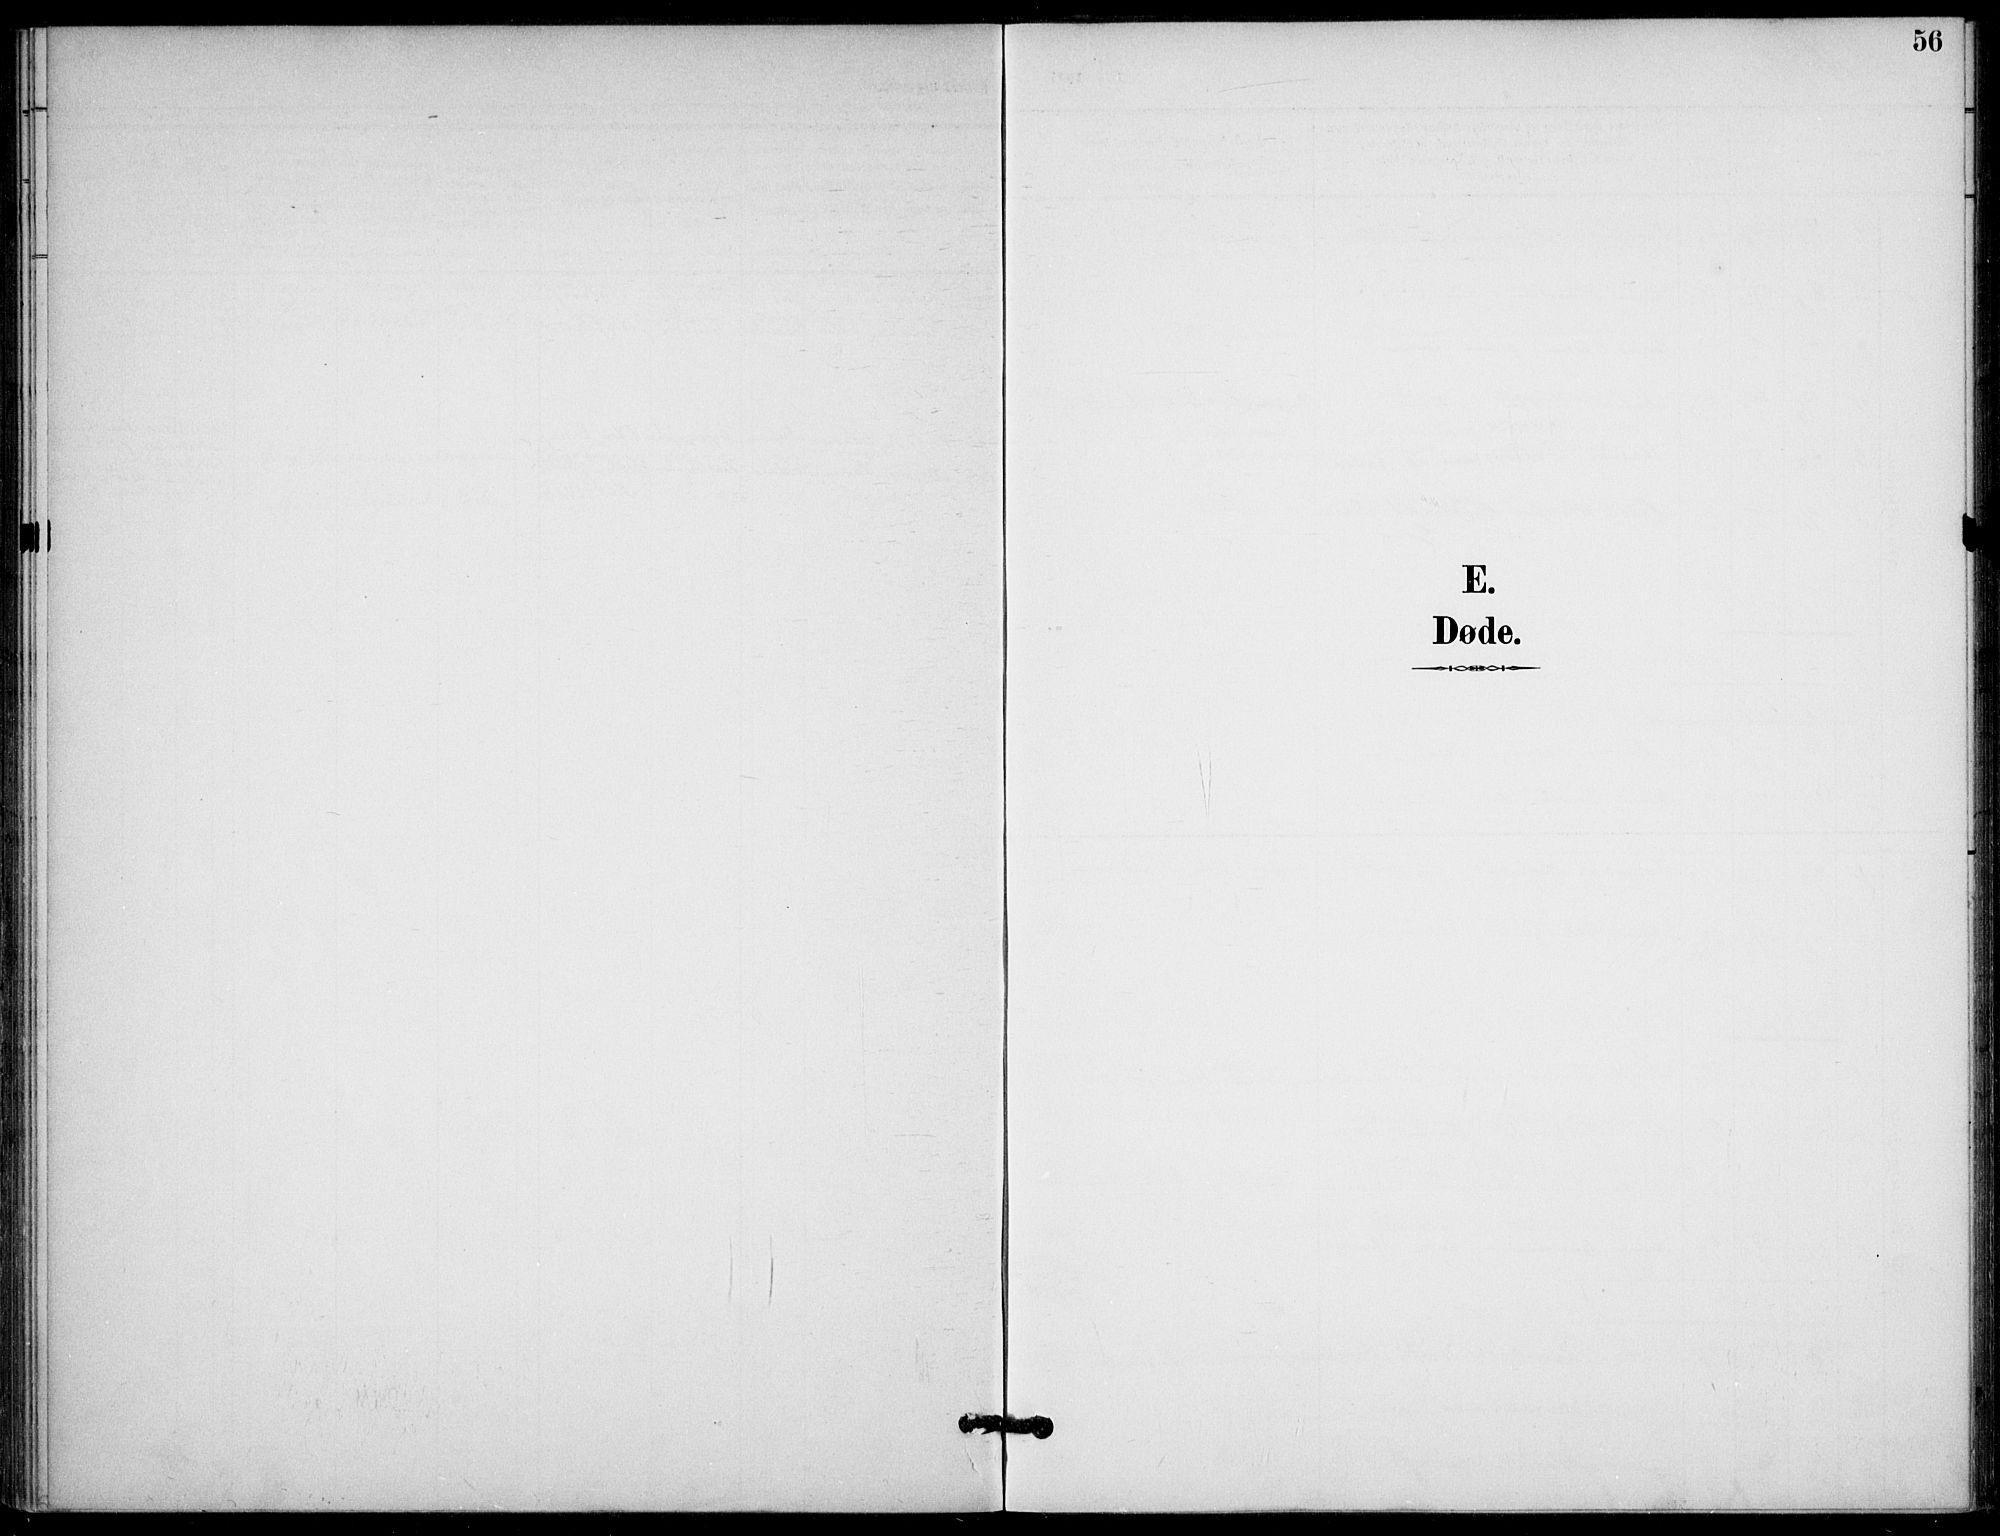 SAKO, Lunde kirkebøker, F/Fb/L0004: Ministerialbok nr. II 4, 1892-1907, s. 56